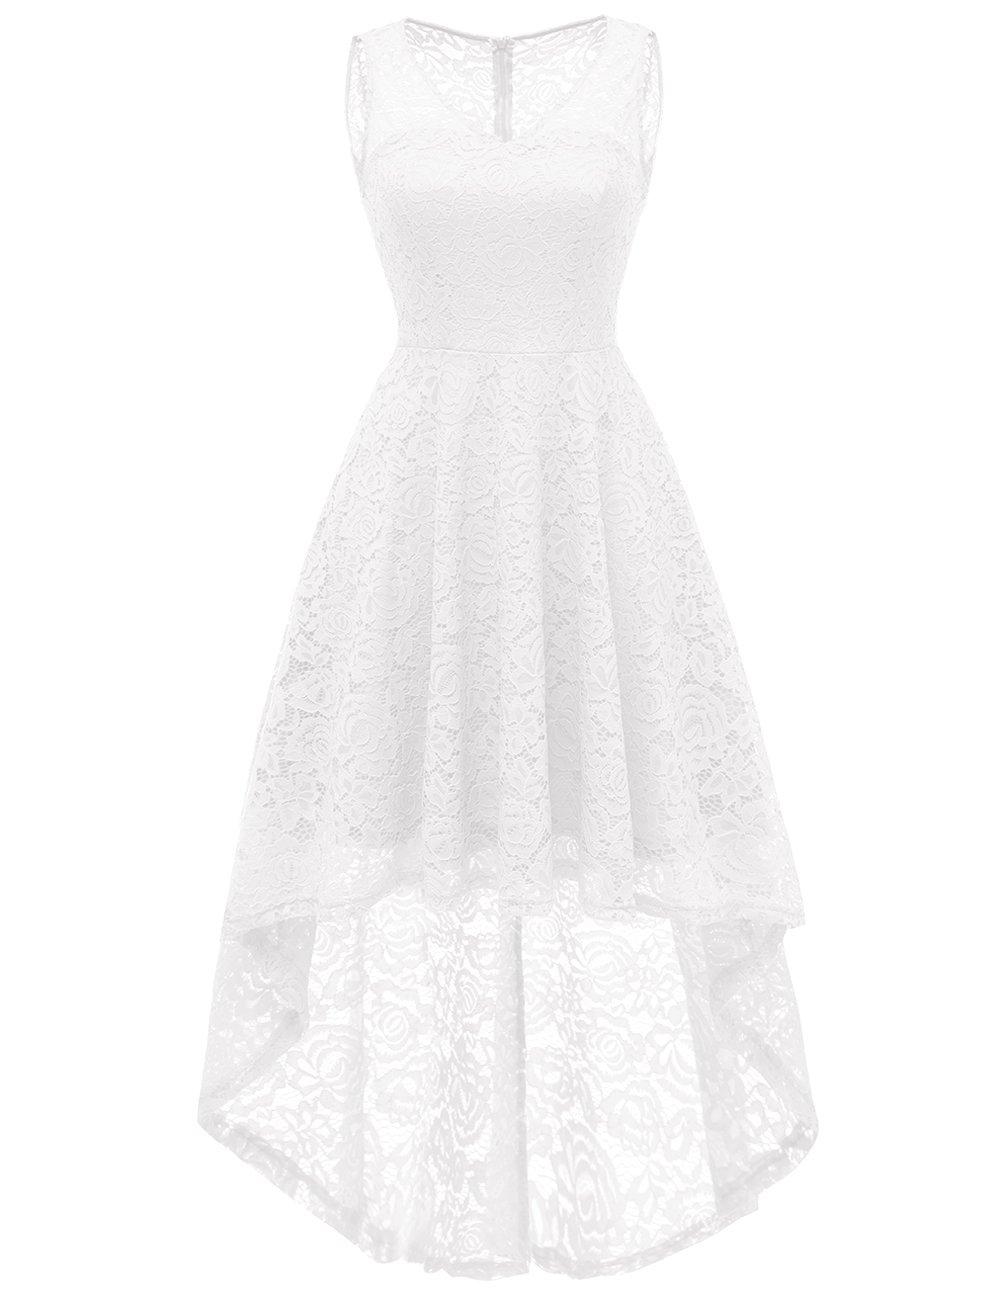 DRESSTELLS Women's Cocktail V-Neck Dress Floral Lace Hi-Lo Formal Swing Party Dress White XL by DRESSTELLS (Image #1)